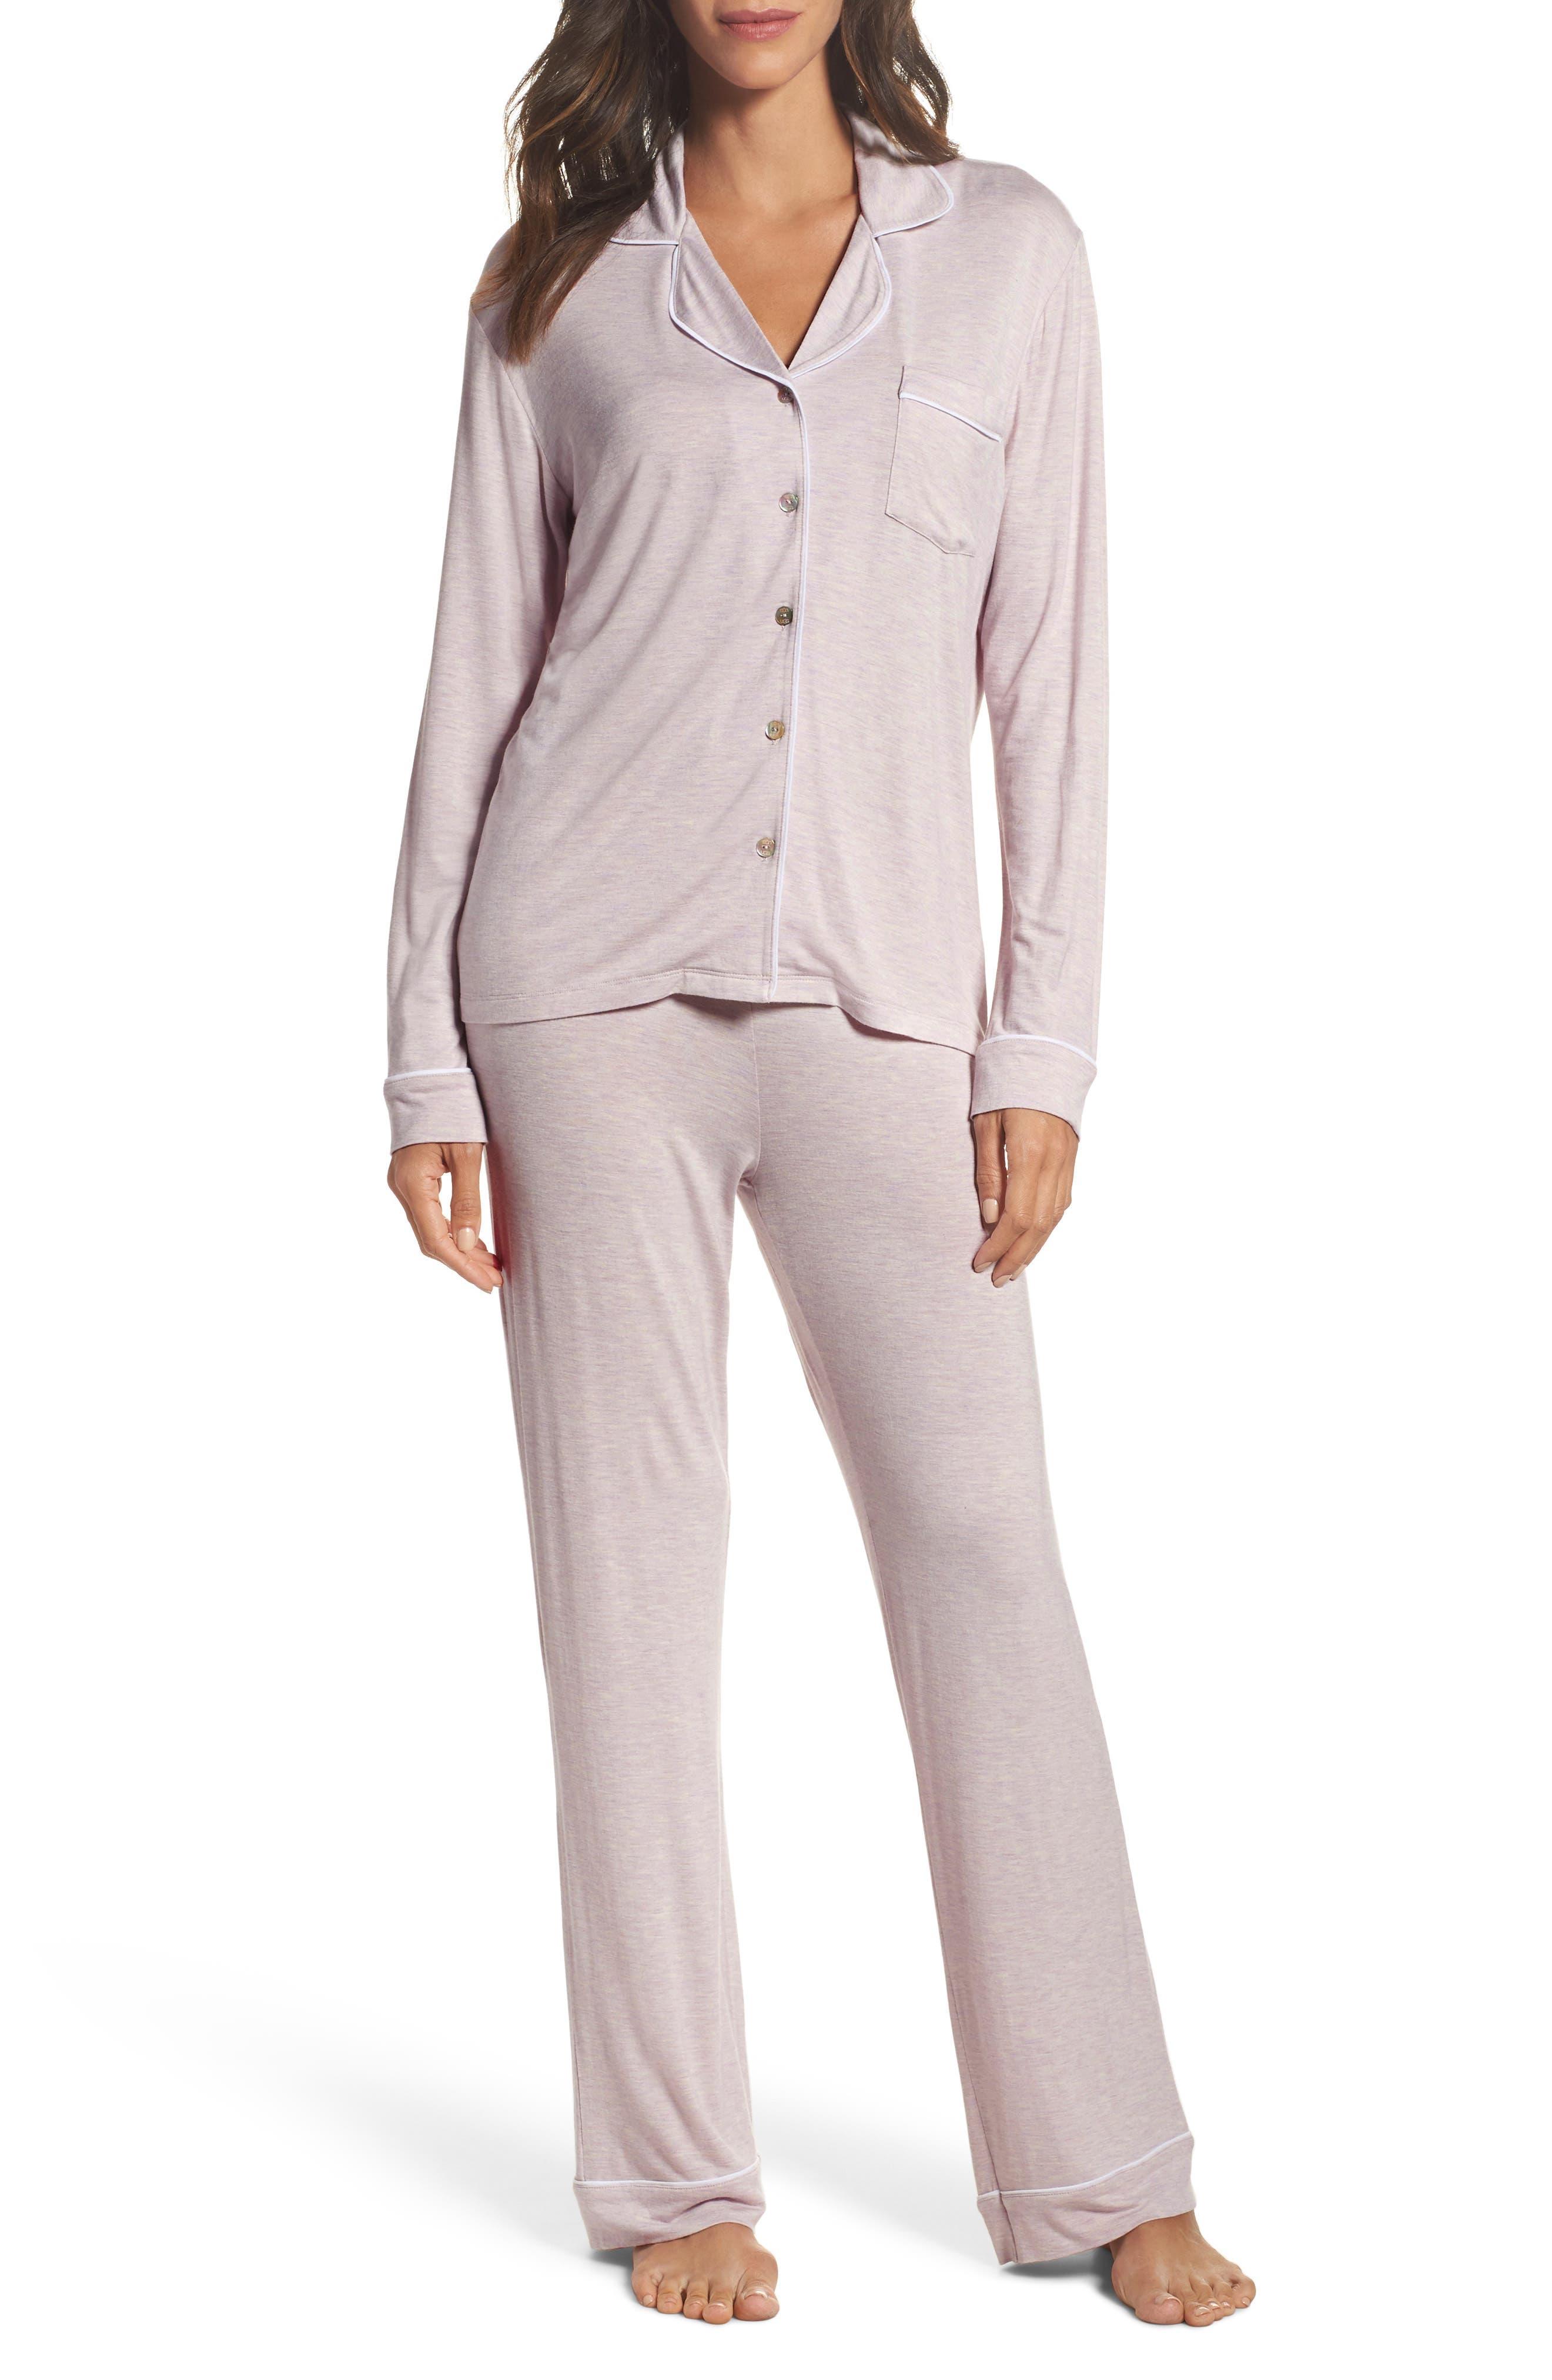 Lenon Jersey Pajamas,                             Main thumbnail 1, color,                             Lavender Fog Heather